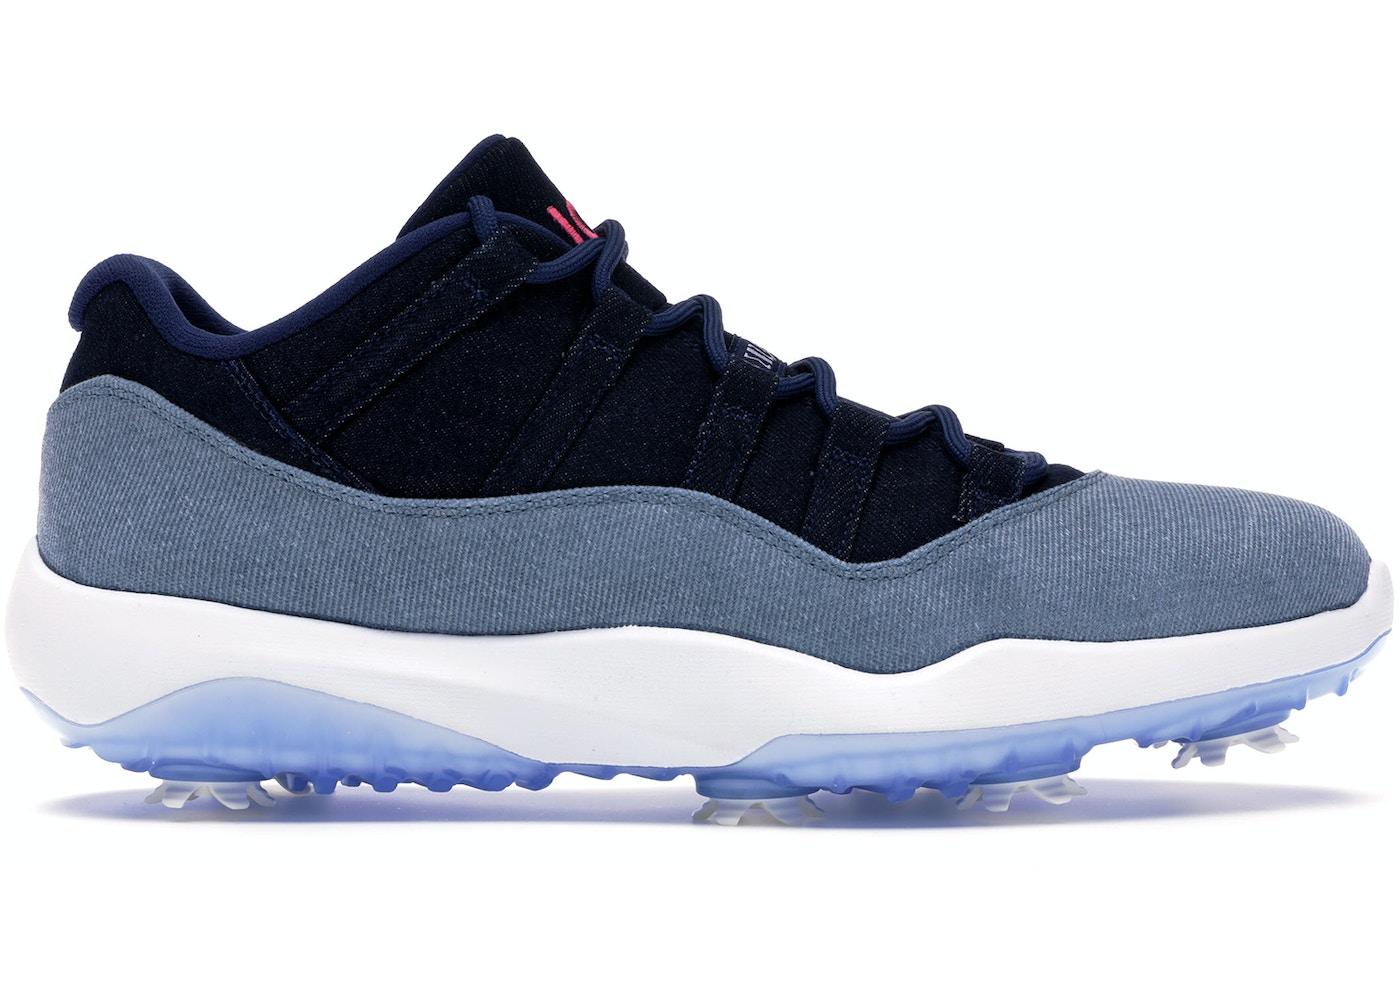 100% authentic 5729f 53106 Buy Air Jordan 11 Shoes   Deadstock Sneakers